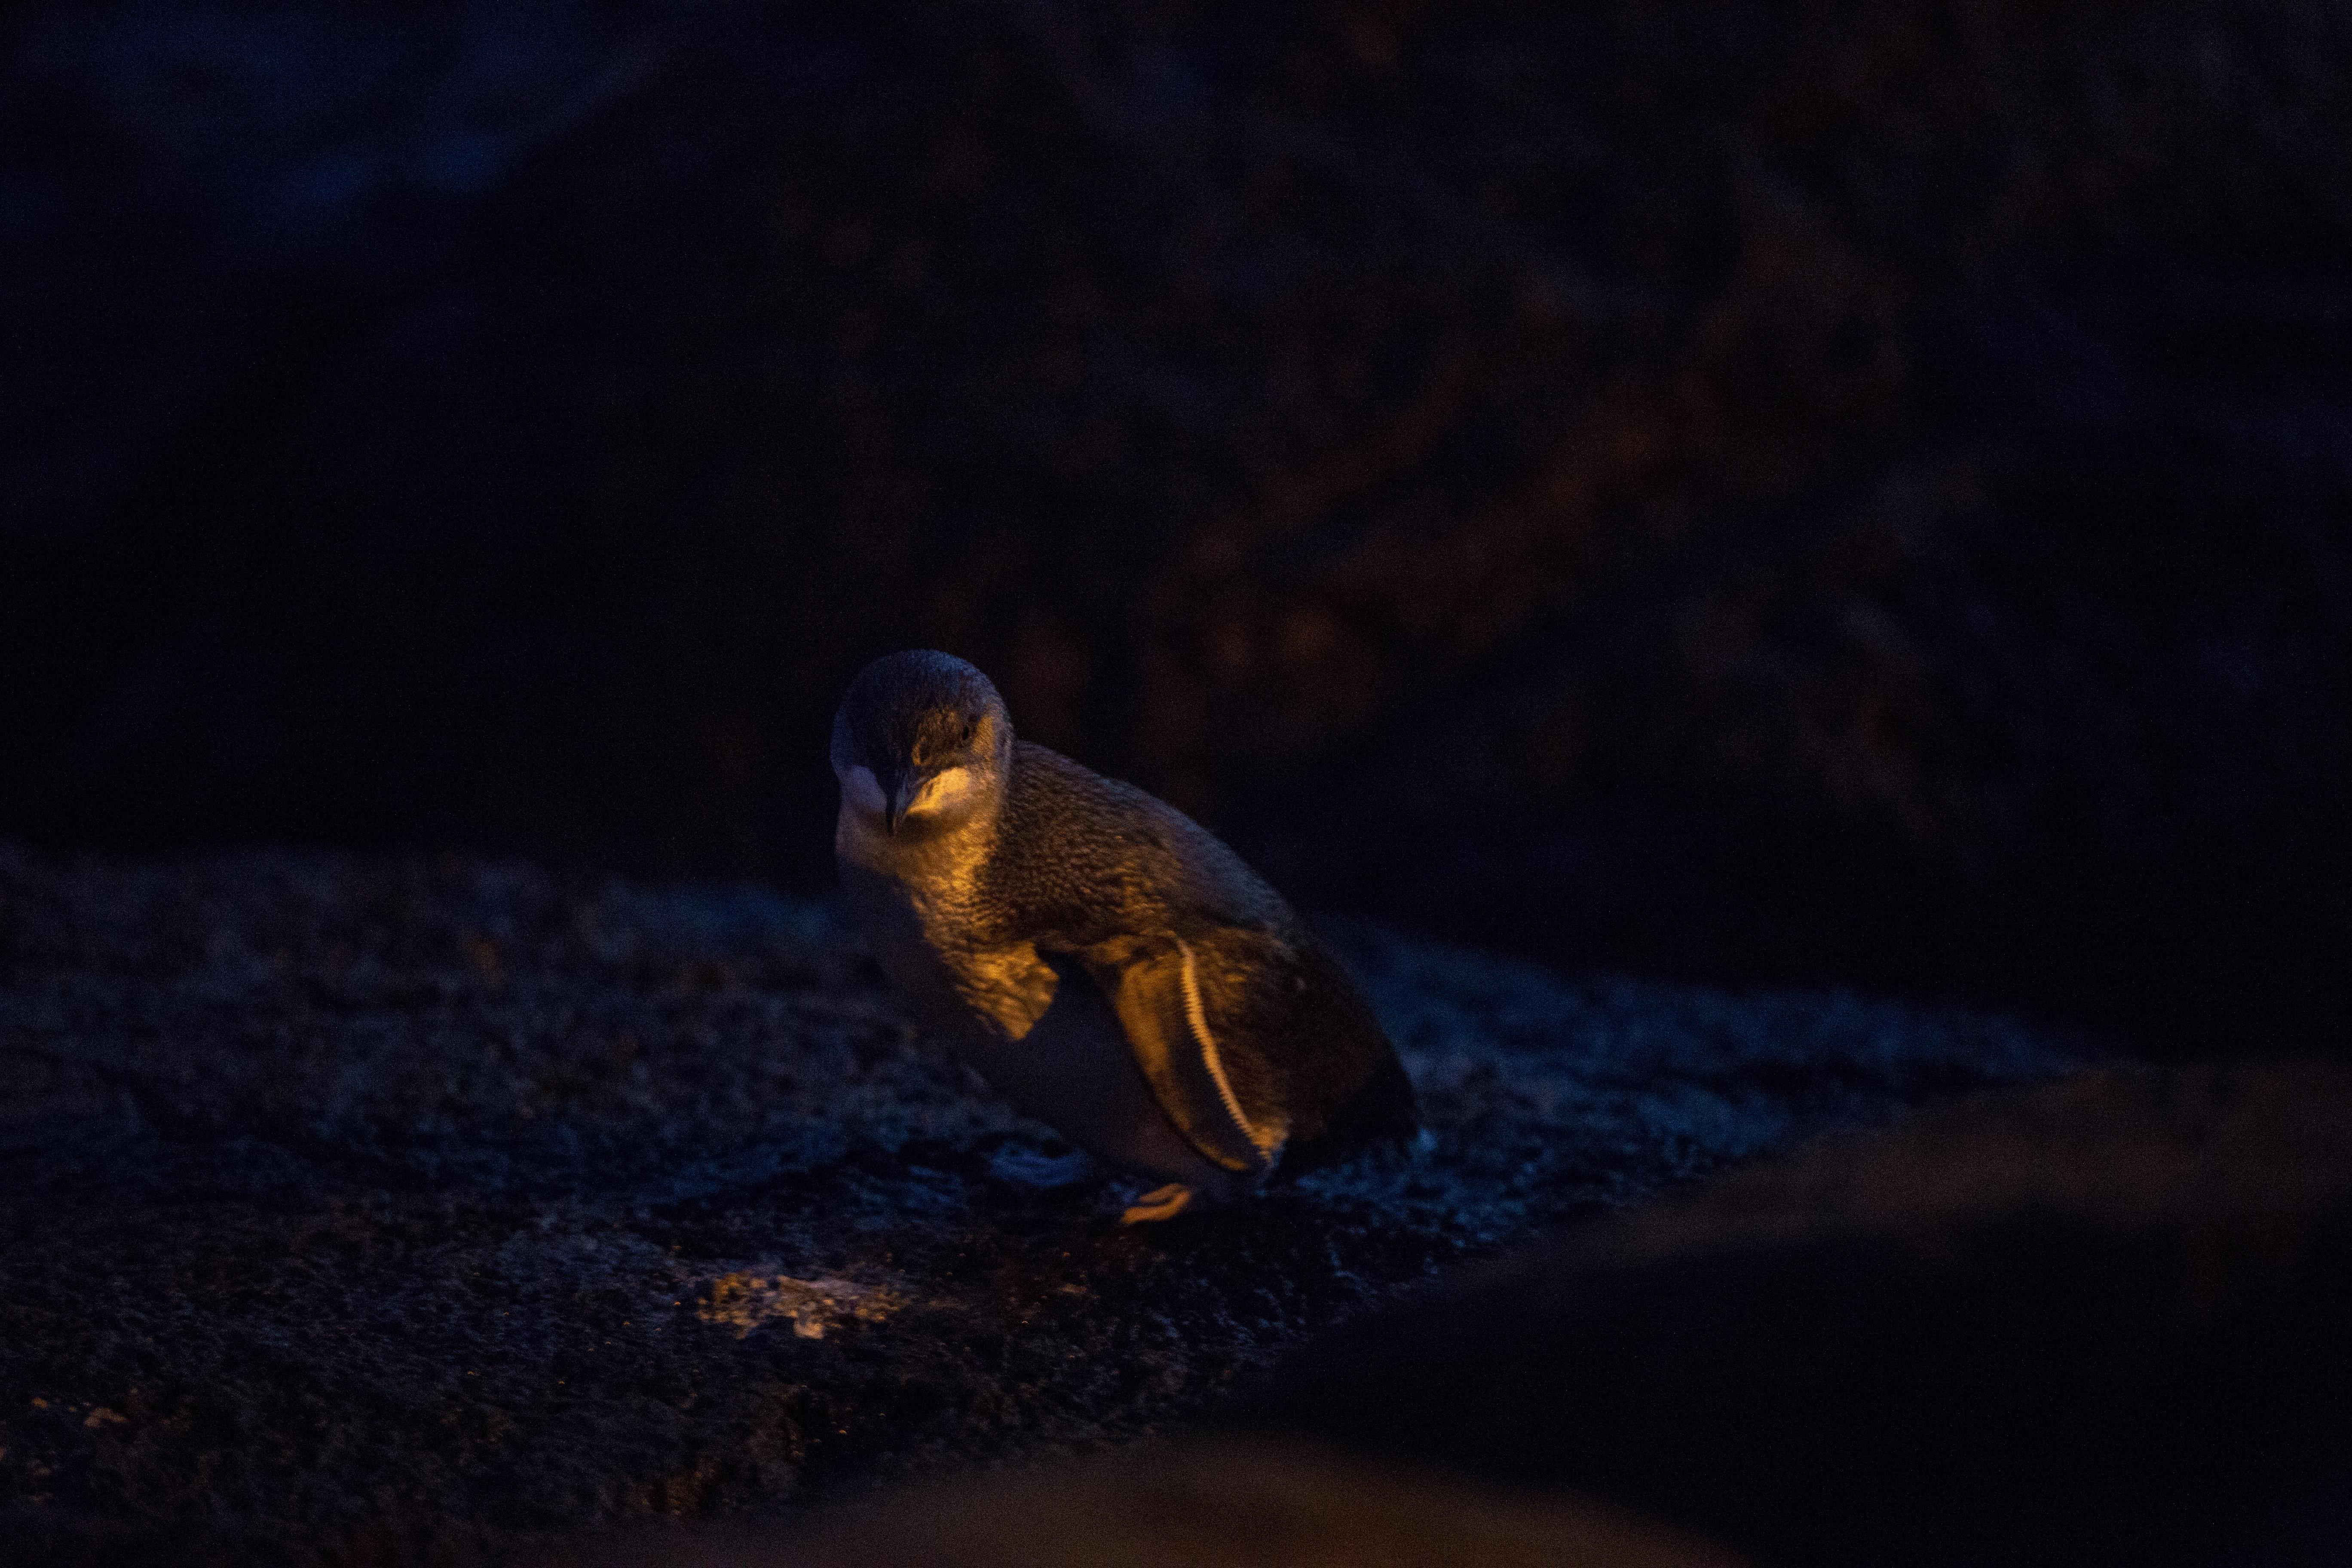 Manchots-St-Kilda-fairy-penguins-5